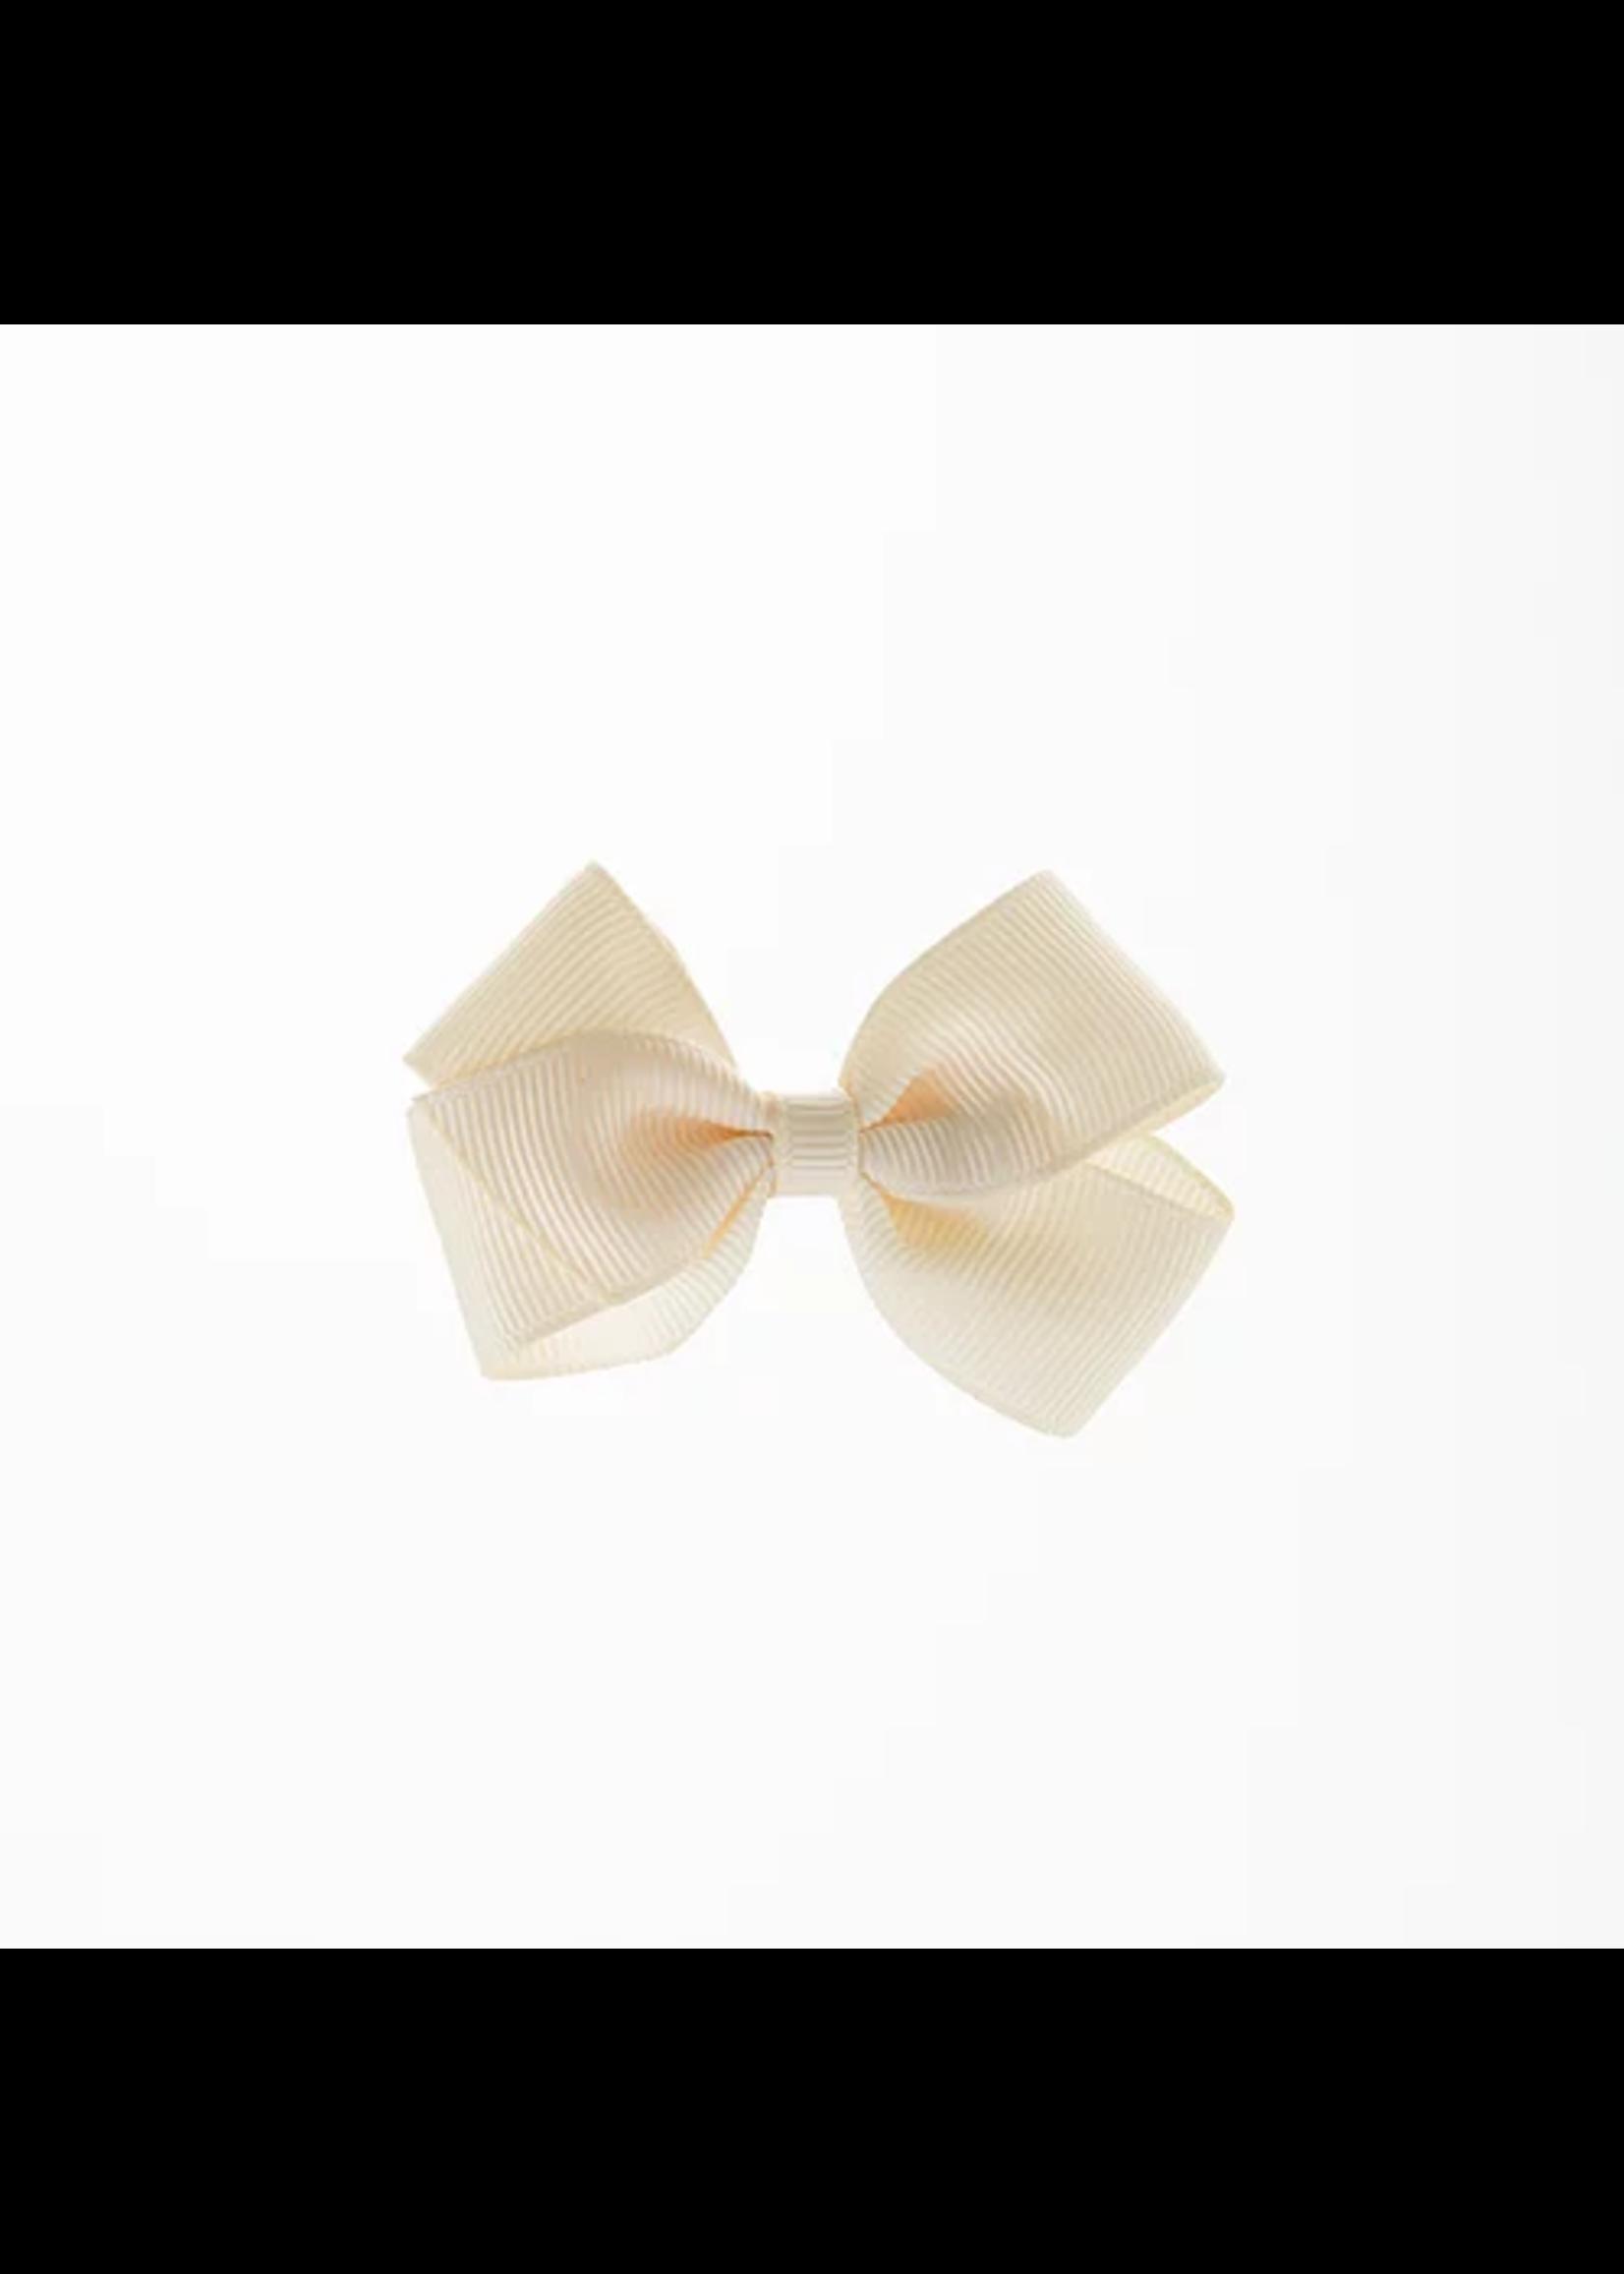 olilia Olilia Small London Bow (Ivory)